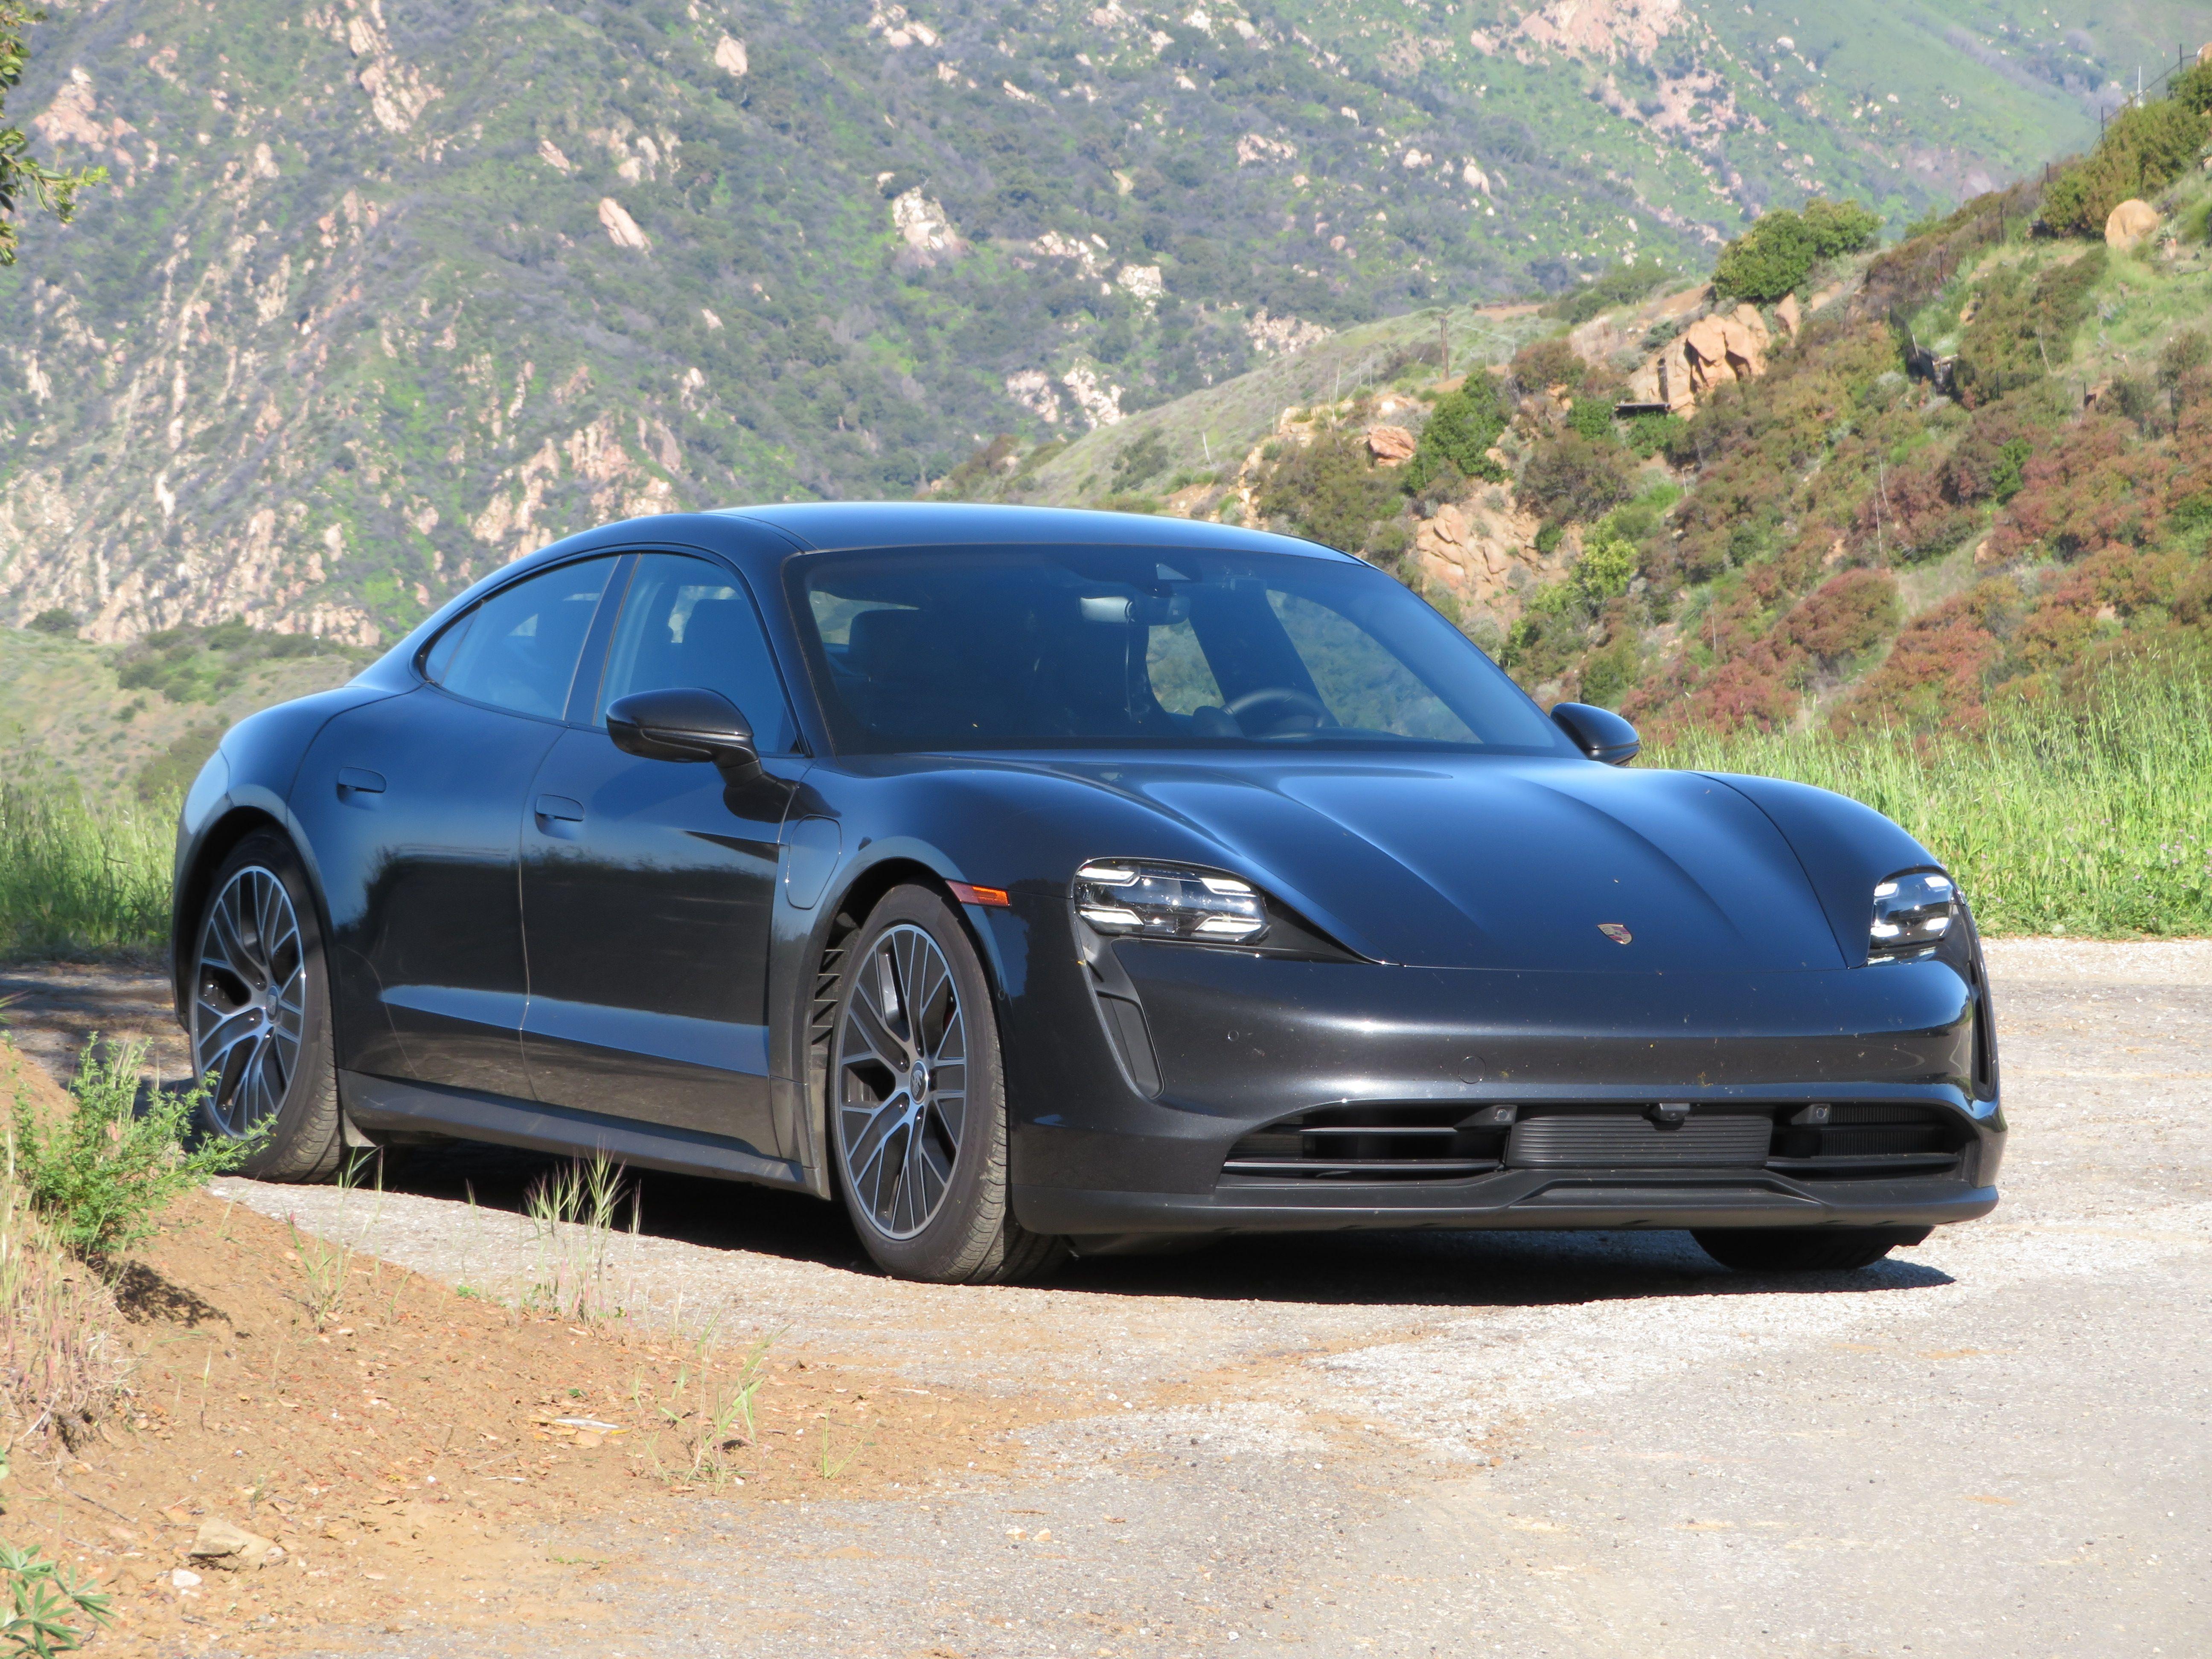 2021 Porsche Taycan 4s S Epa Range Beaten Review Photos